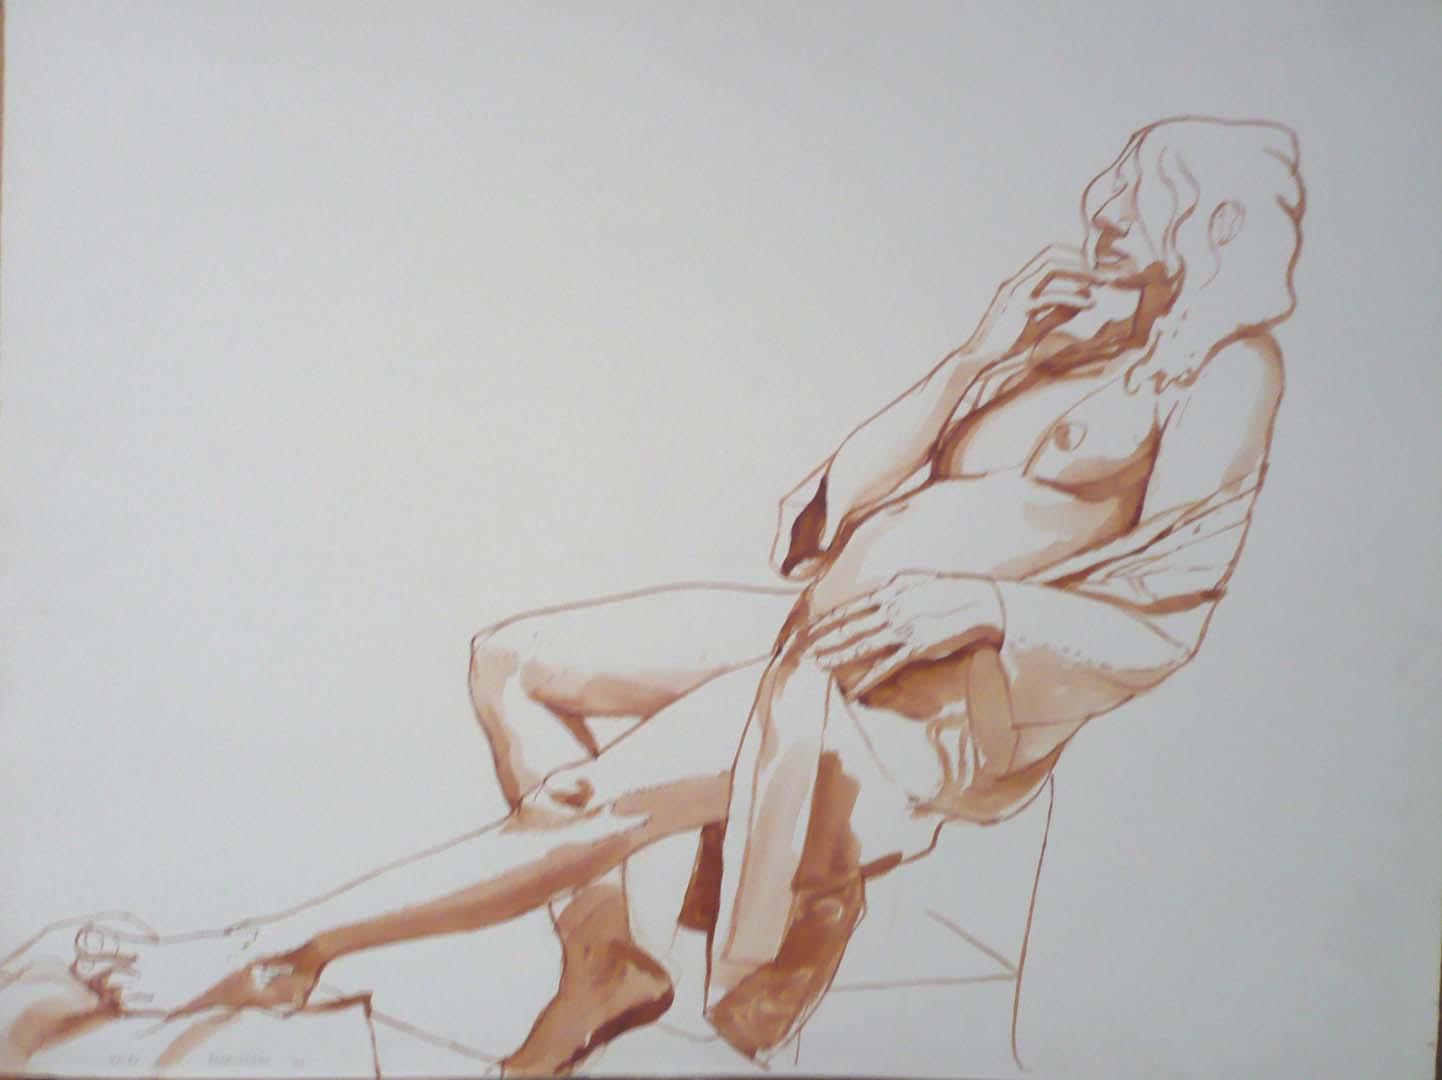 1969 Female Model reclining Backwards Sepia on Paper 20.75 x 27.375